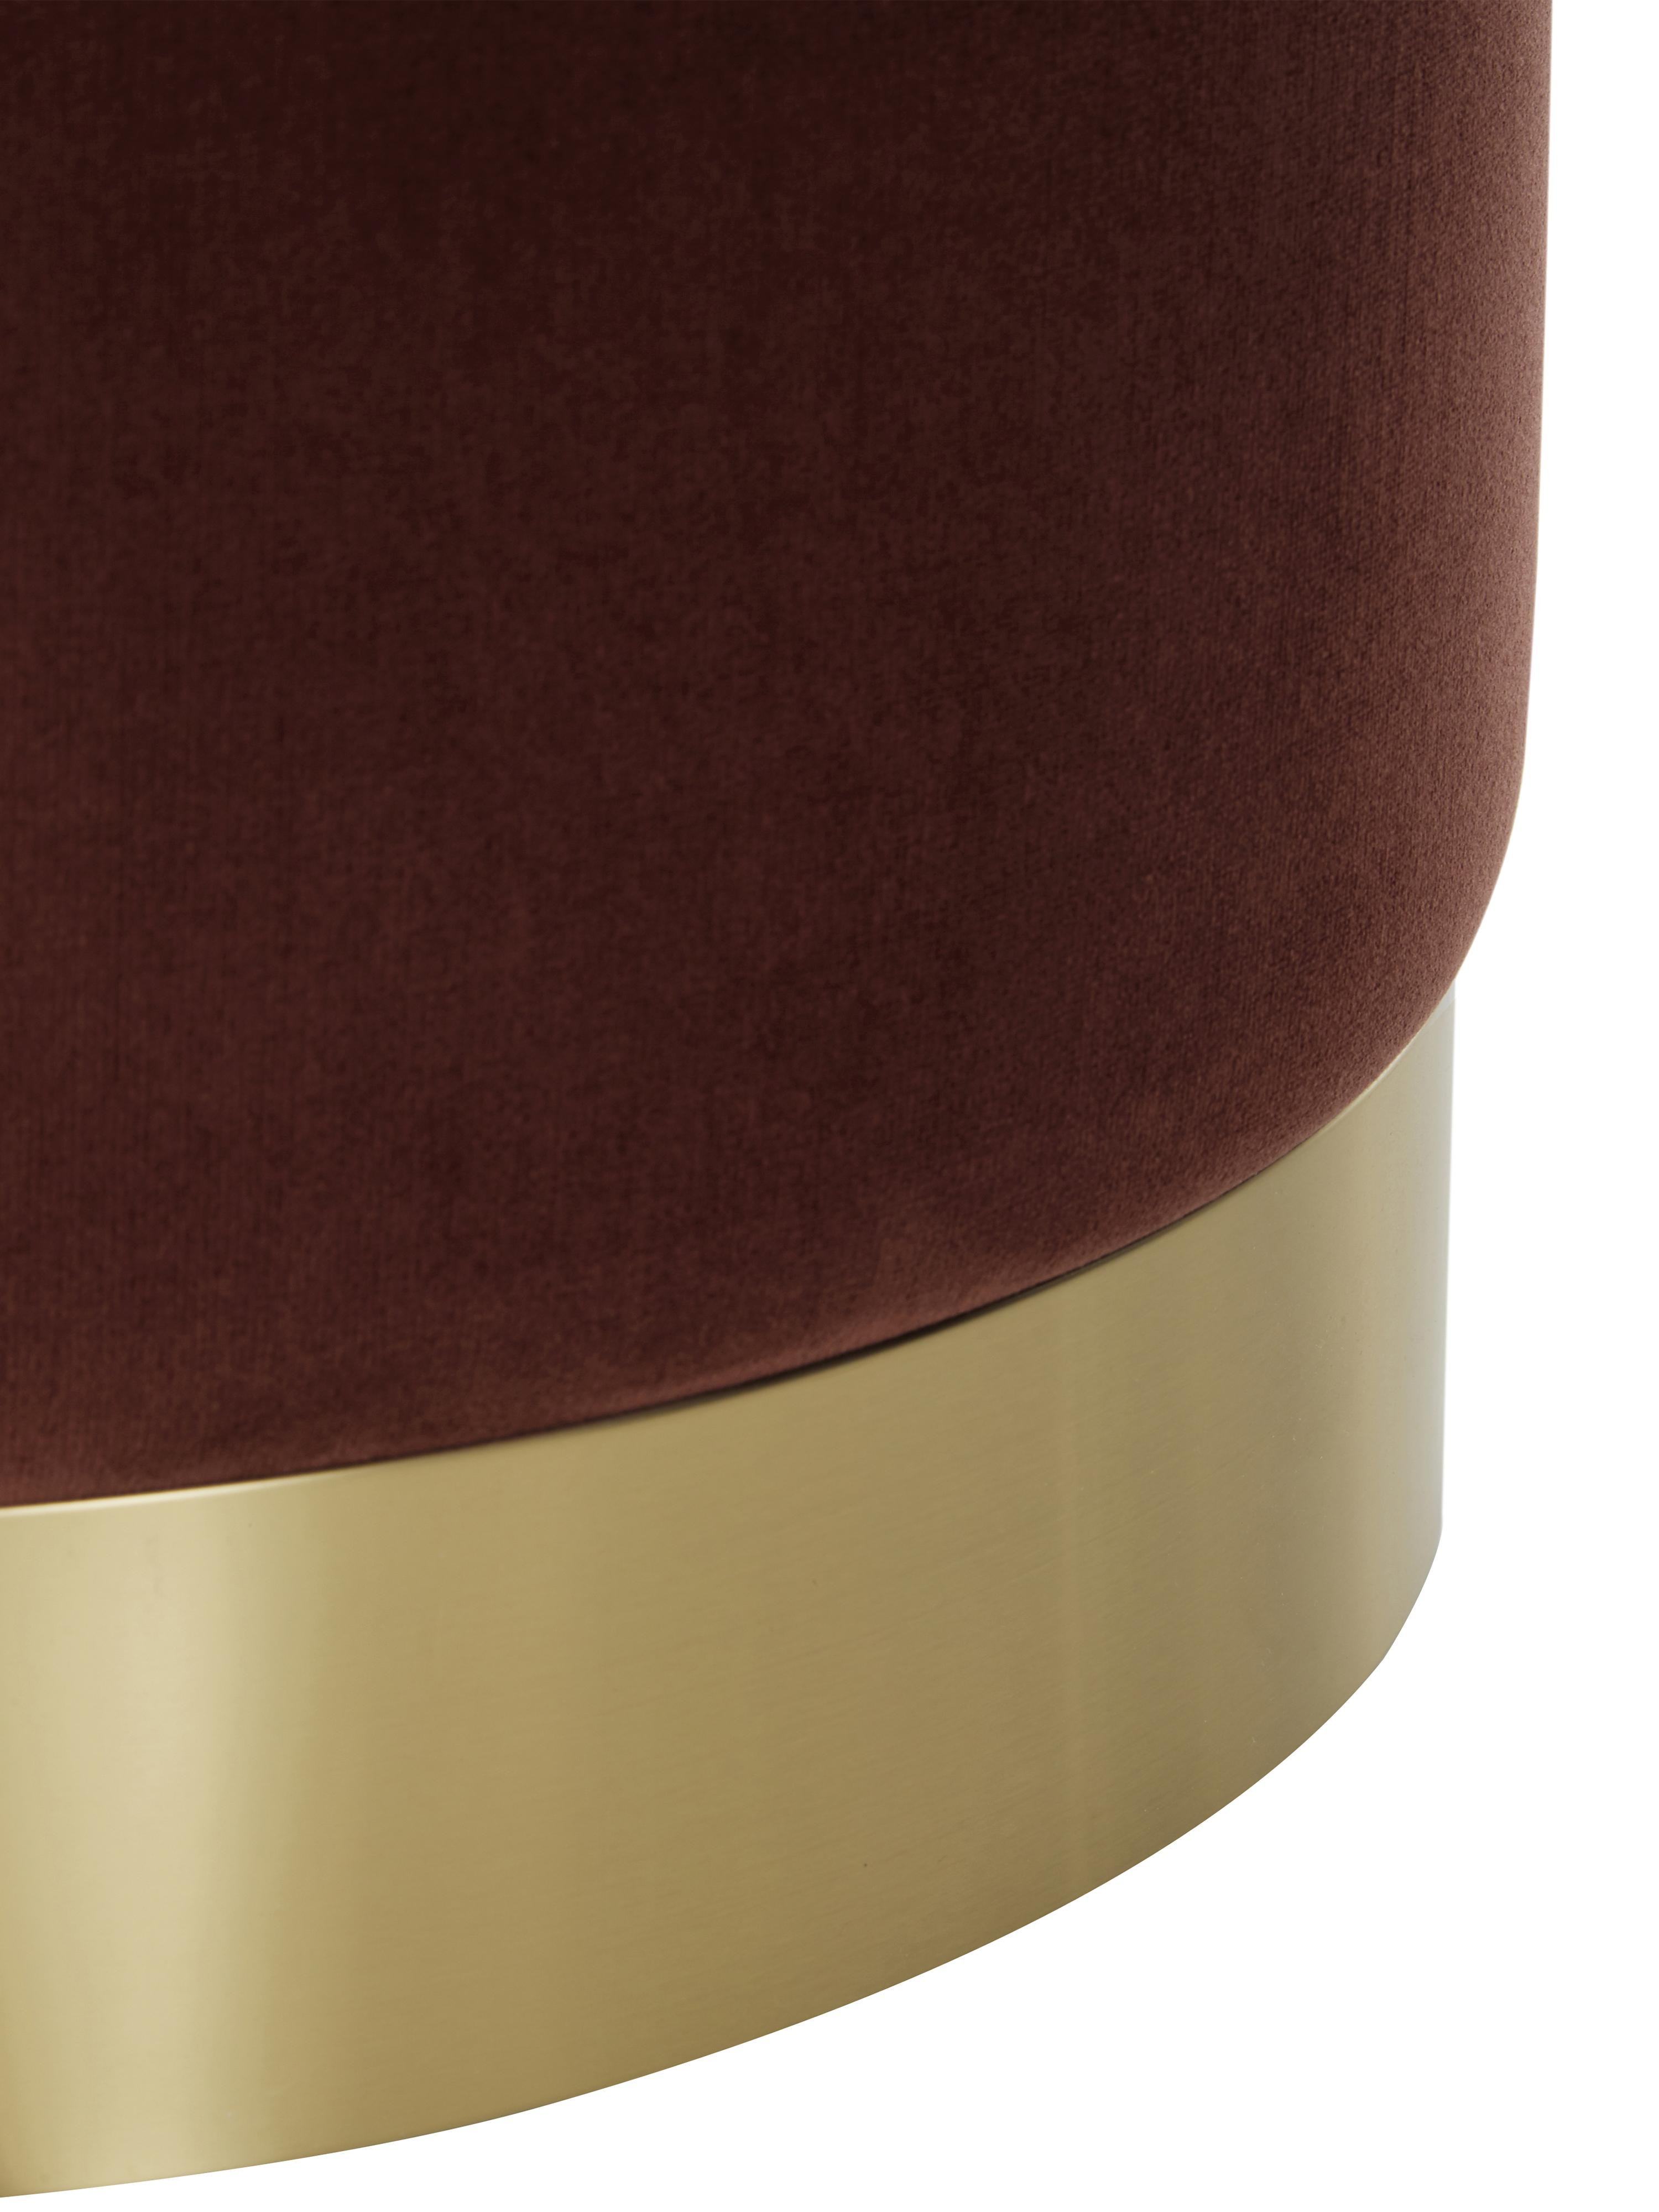 Samt-Hocker Orchid, Bezug: Samt (Polyester) Der hoch, Rahmen: Sperrholz, Bezug: Rostrot Fuß: Goldfarben, Ø 38 x H 38 cm